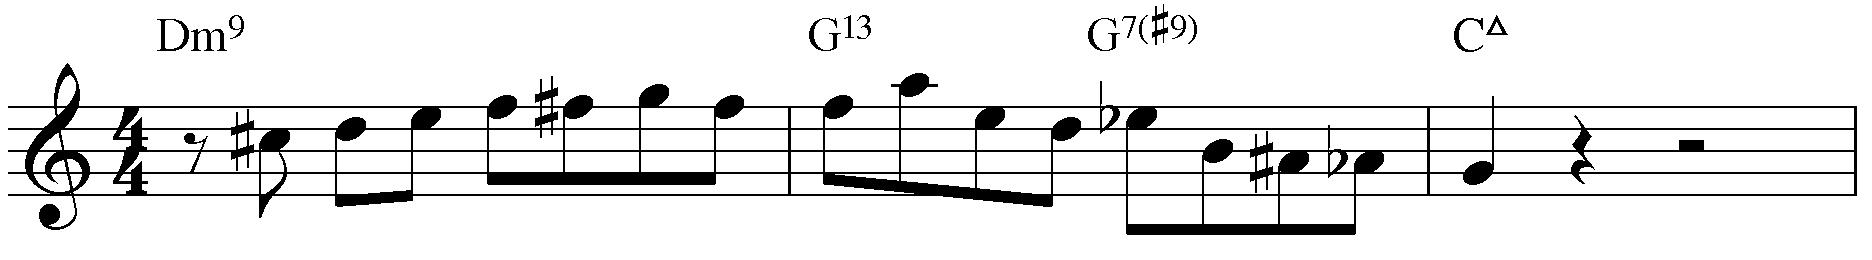 Jazzpattern IIm7 - V7 - IMaj7. C-Dur.